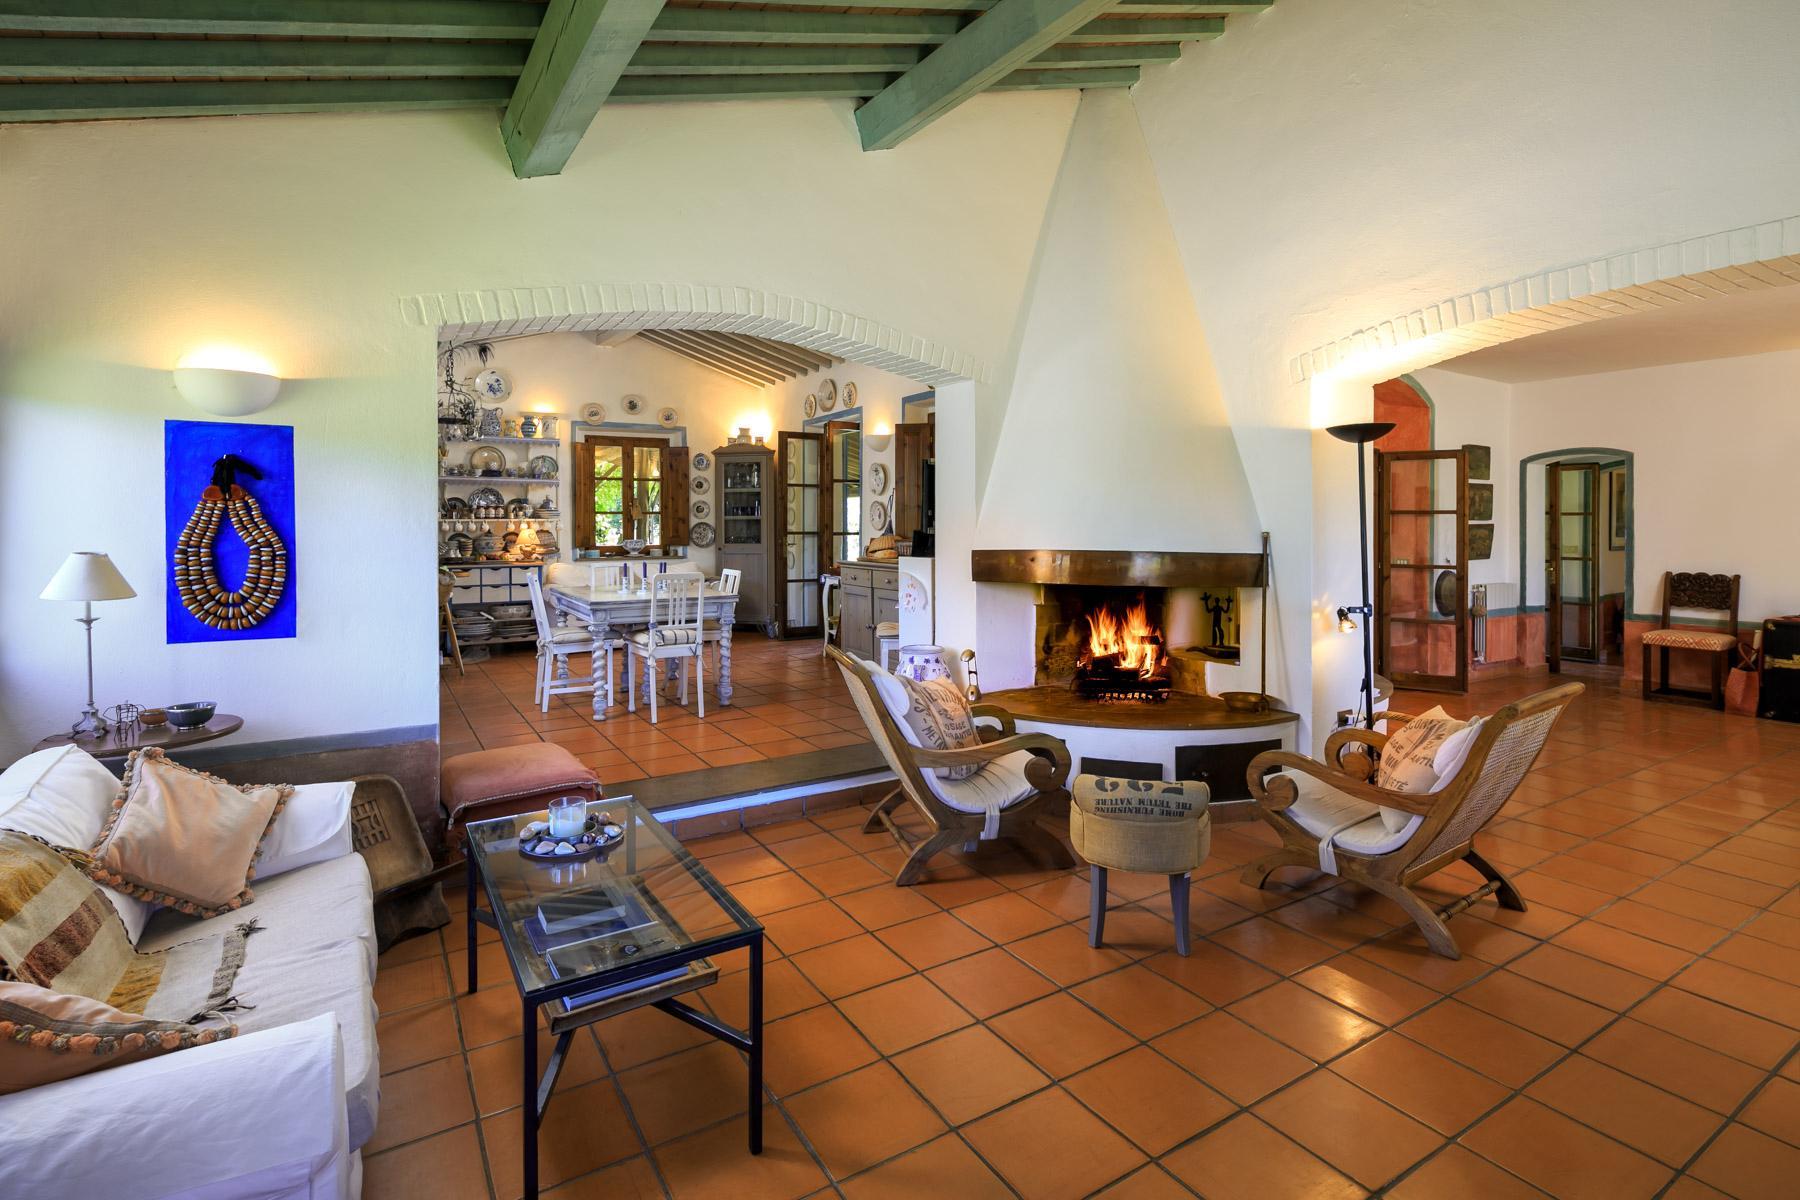 Belle villa toscane avec piscine - 13